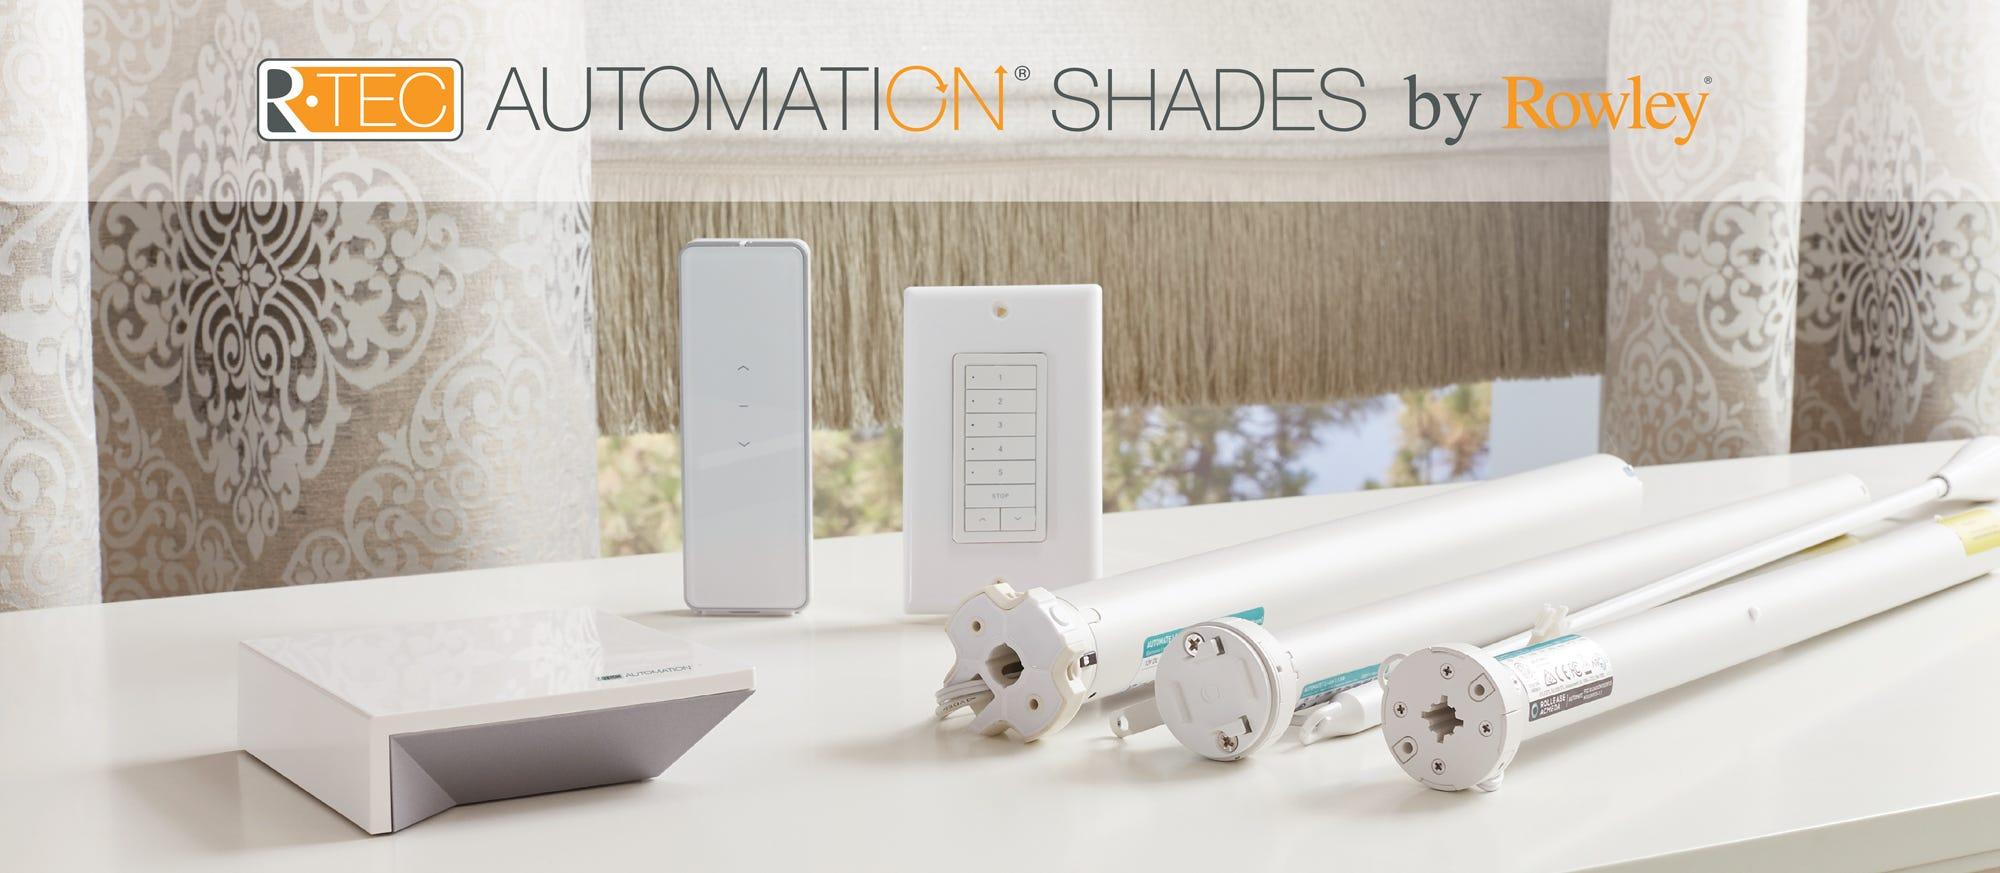 R-TEC Automation Shades